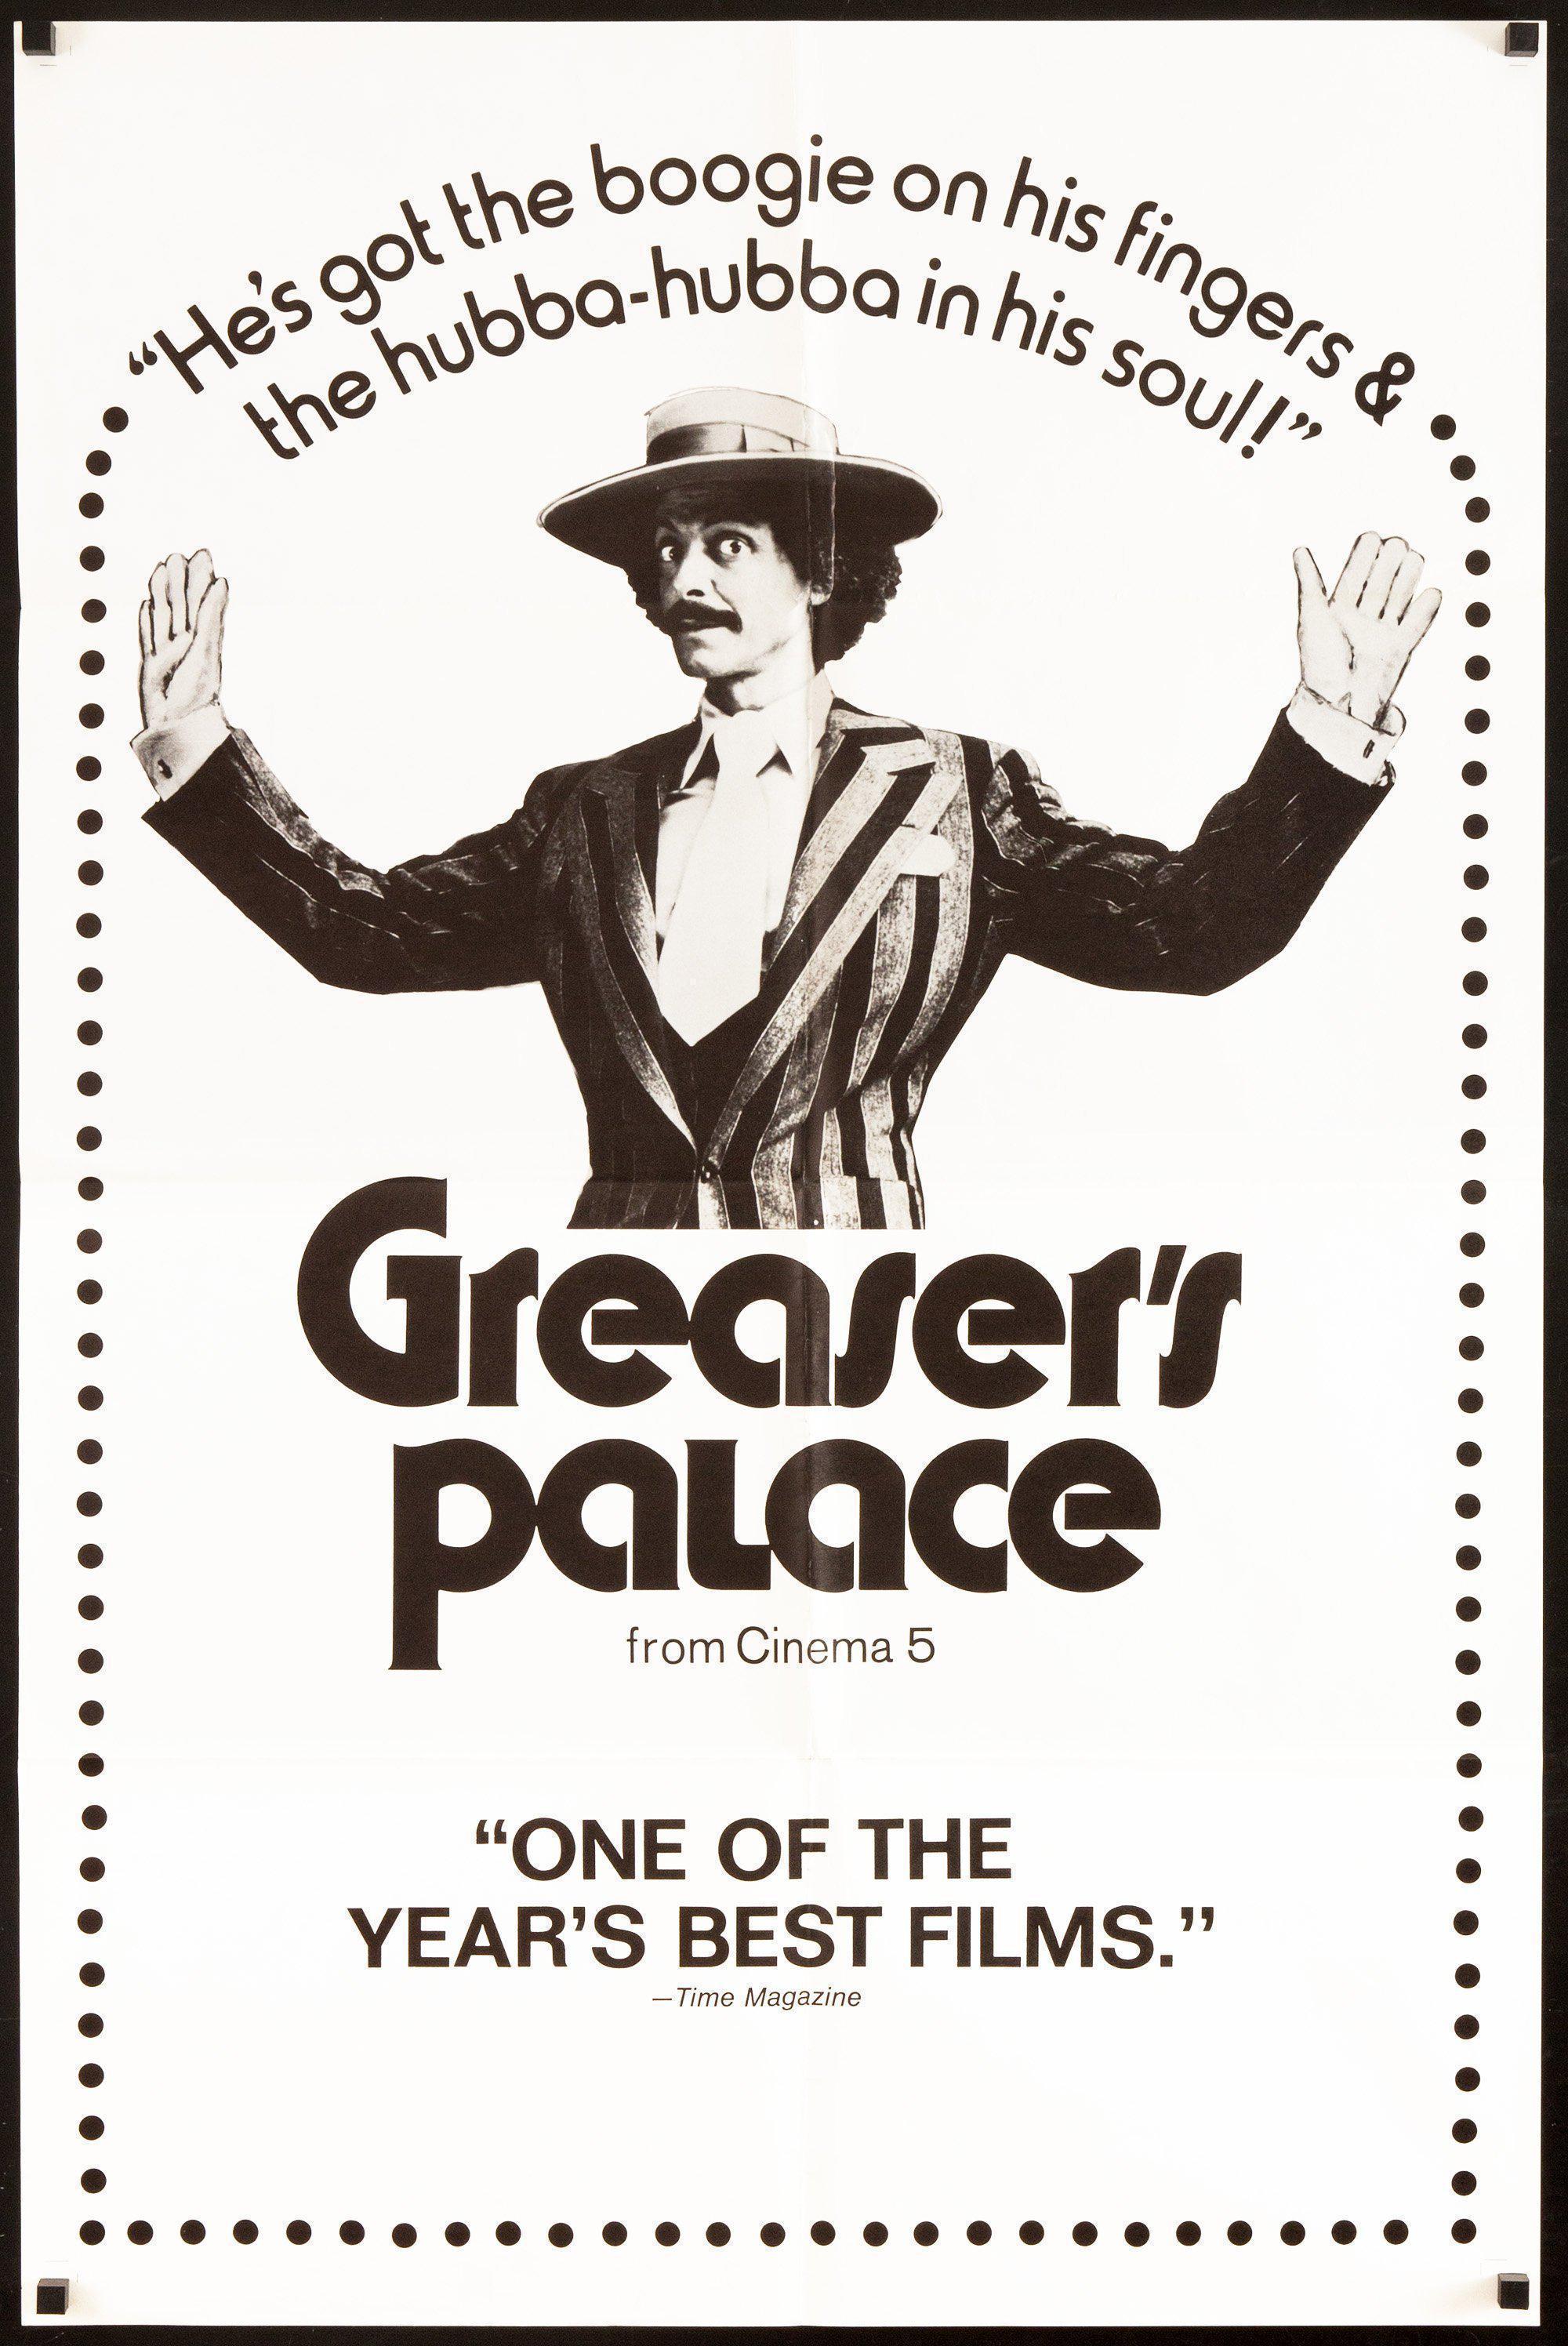 greasers-palace-vintage-movie-poster-original-1-sheet-27_002.jpg